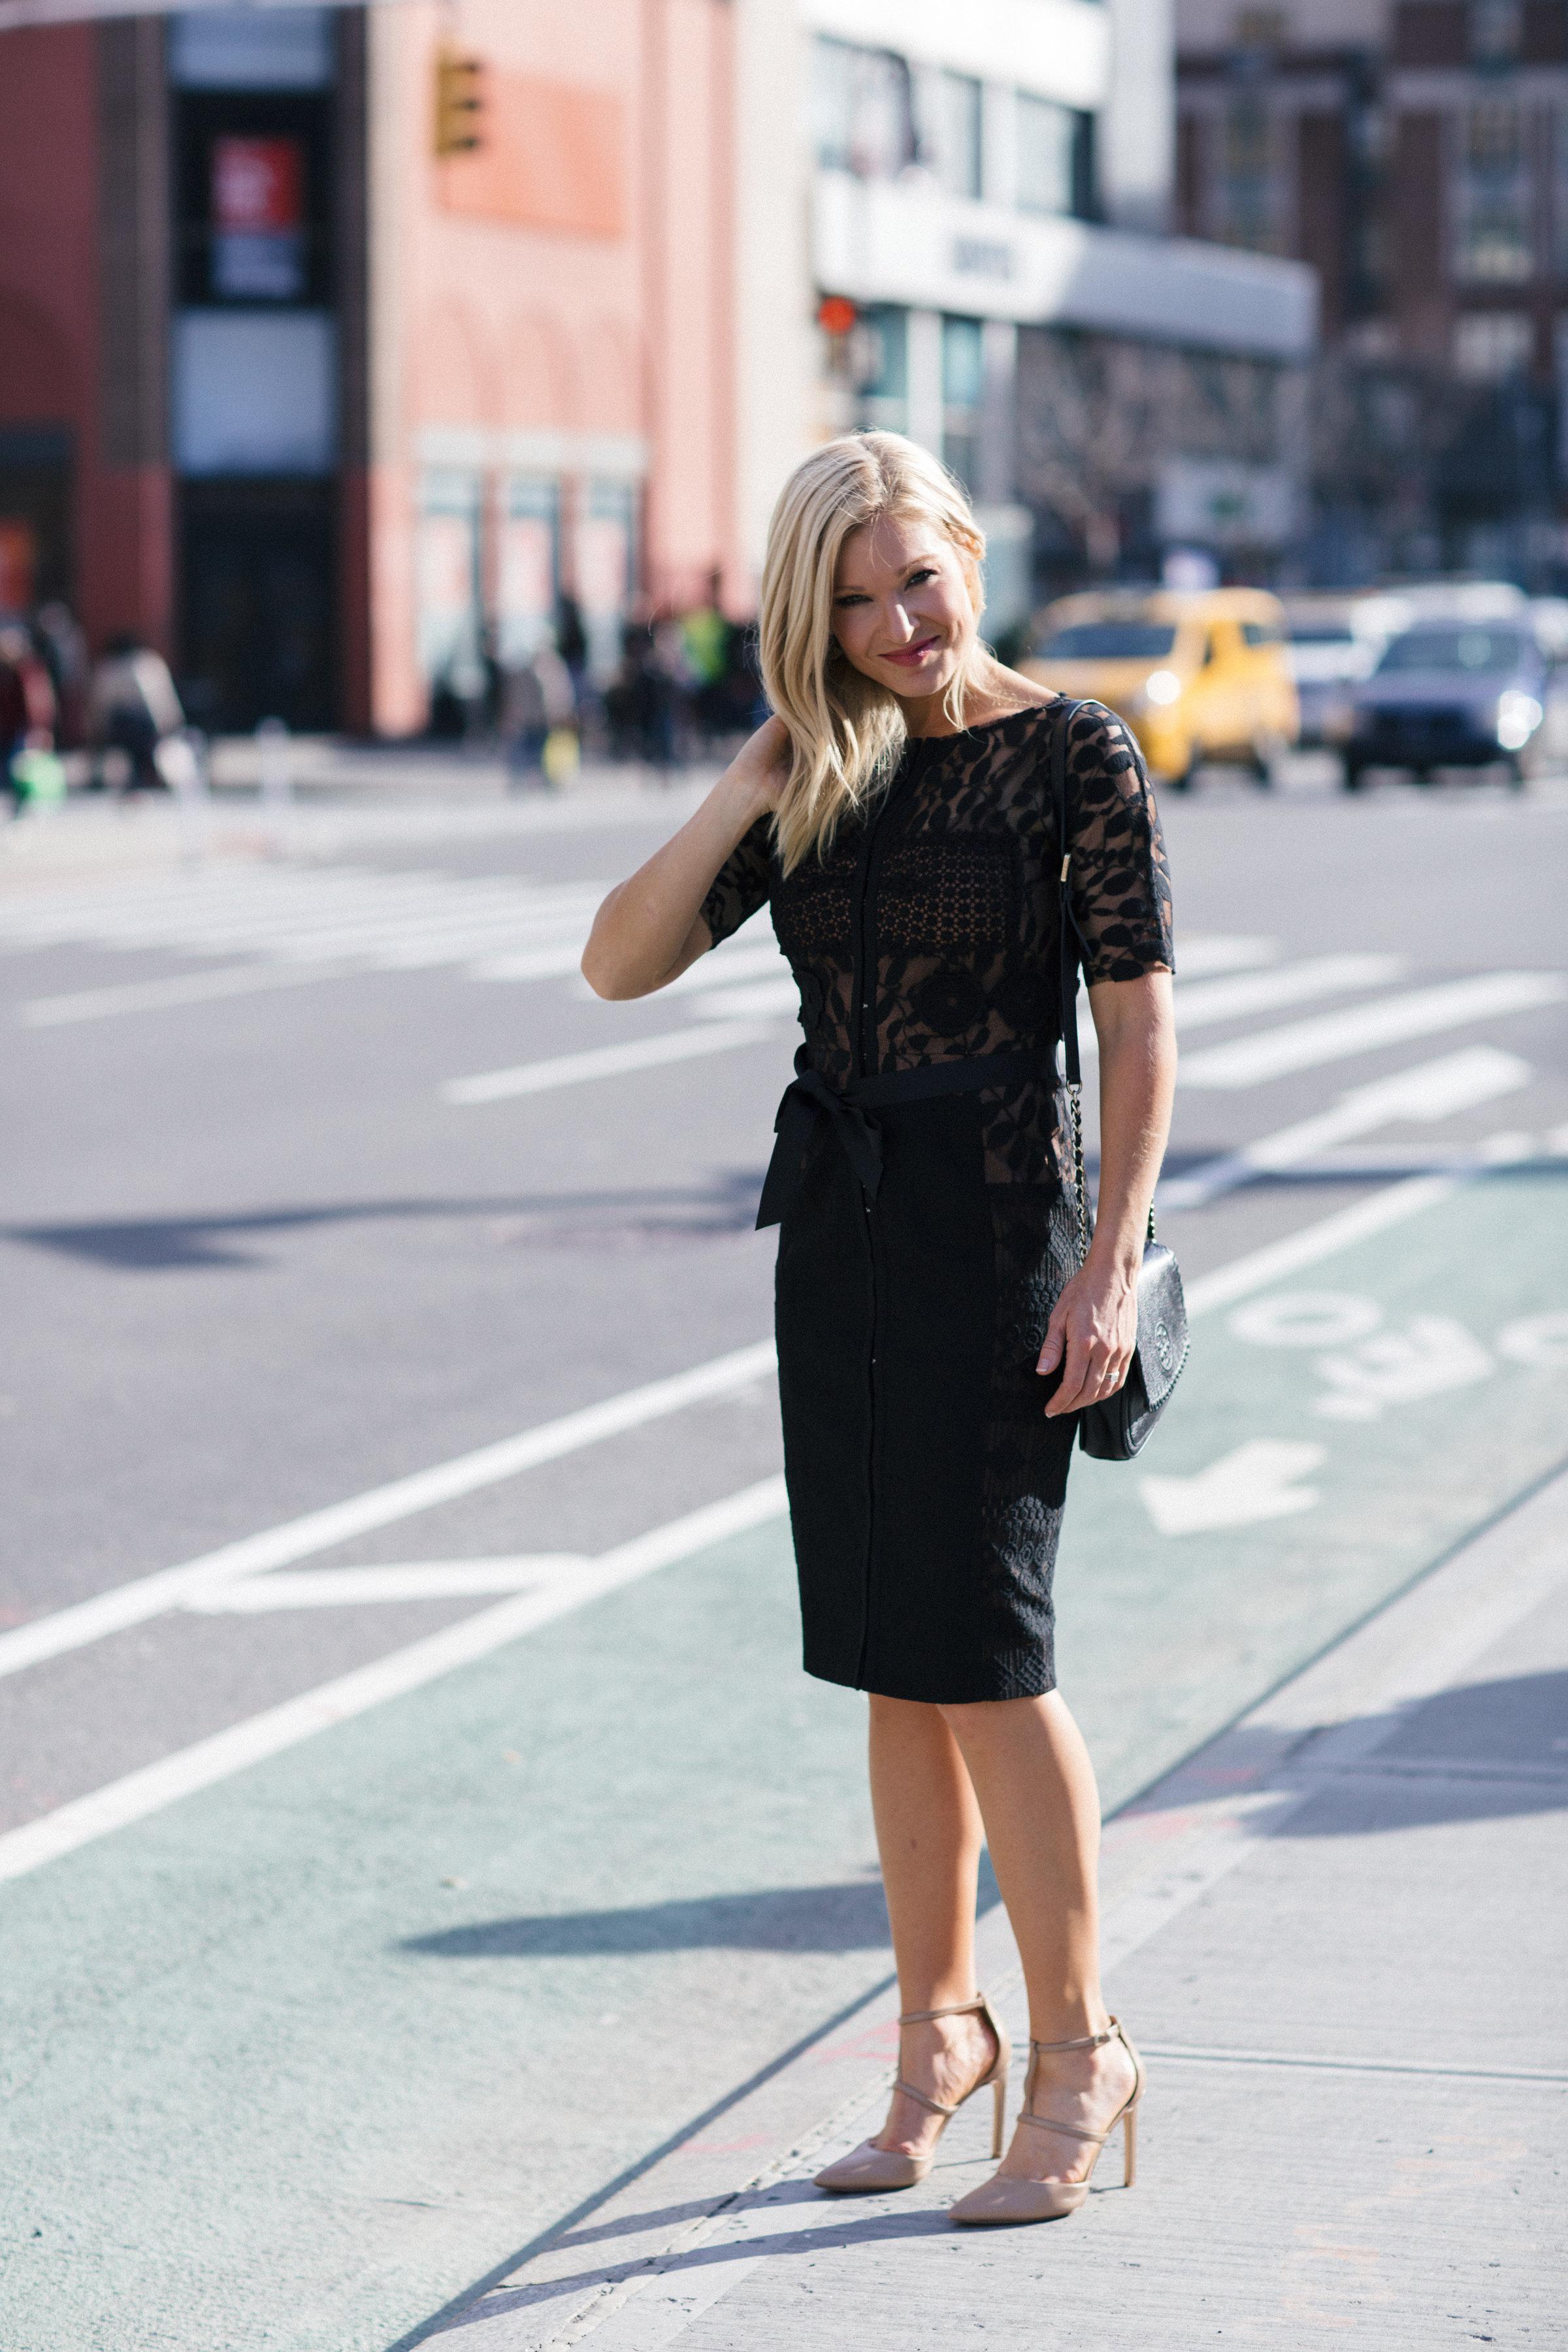 Anna Kooiman New York City www.AnnaKooiman.com fitness travel lifestyle fashion optimism positivity